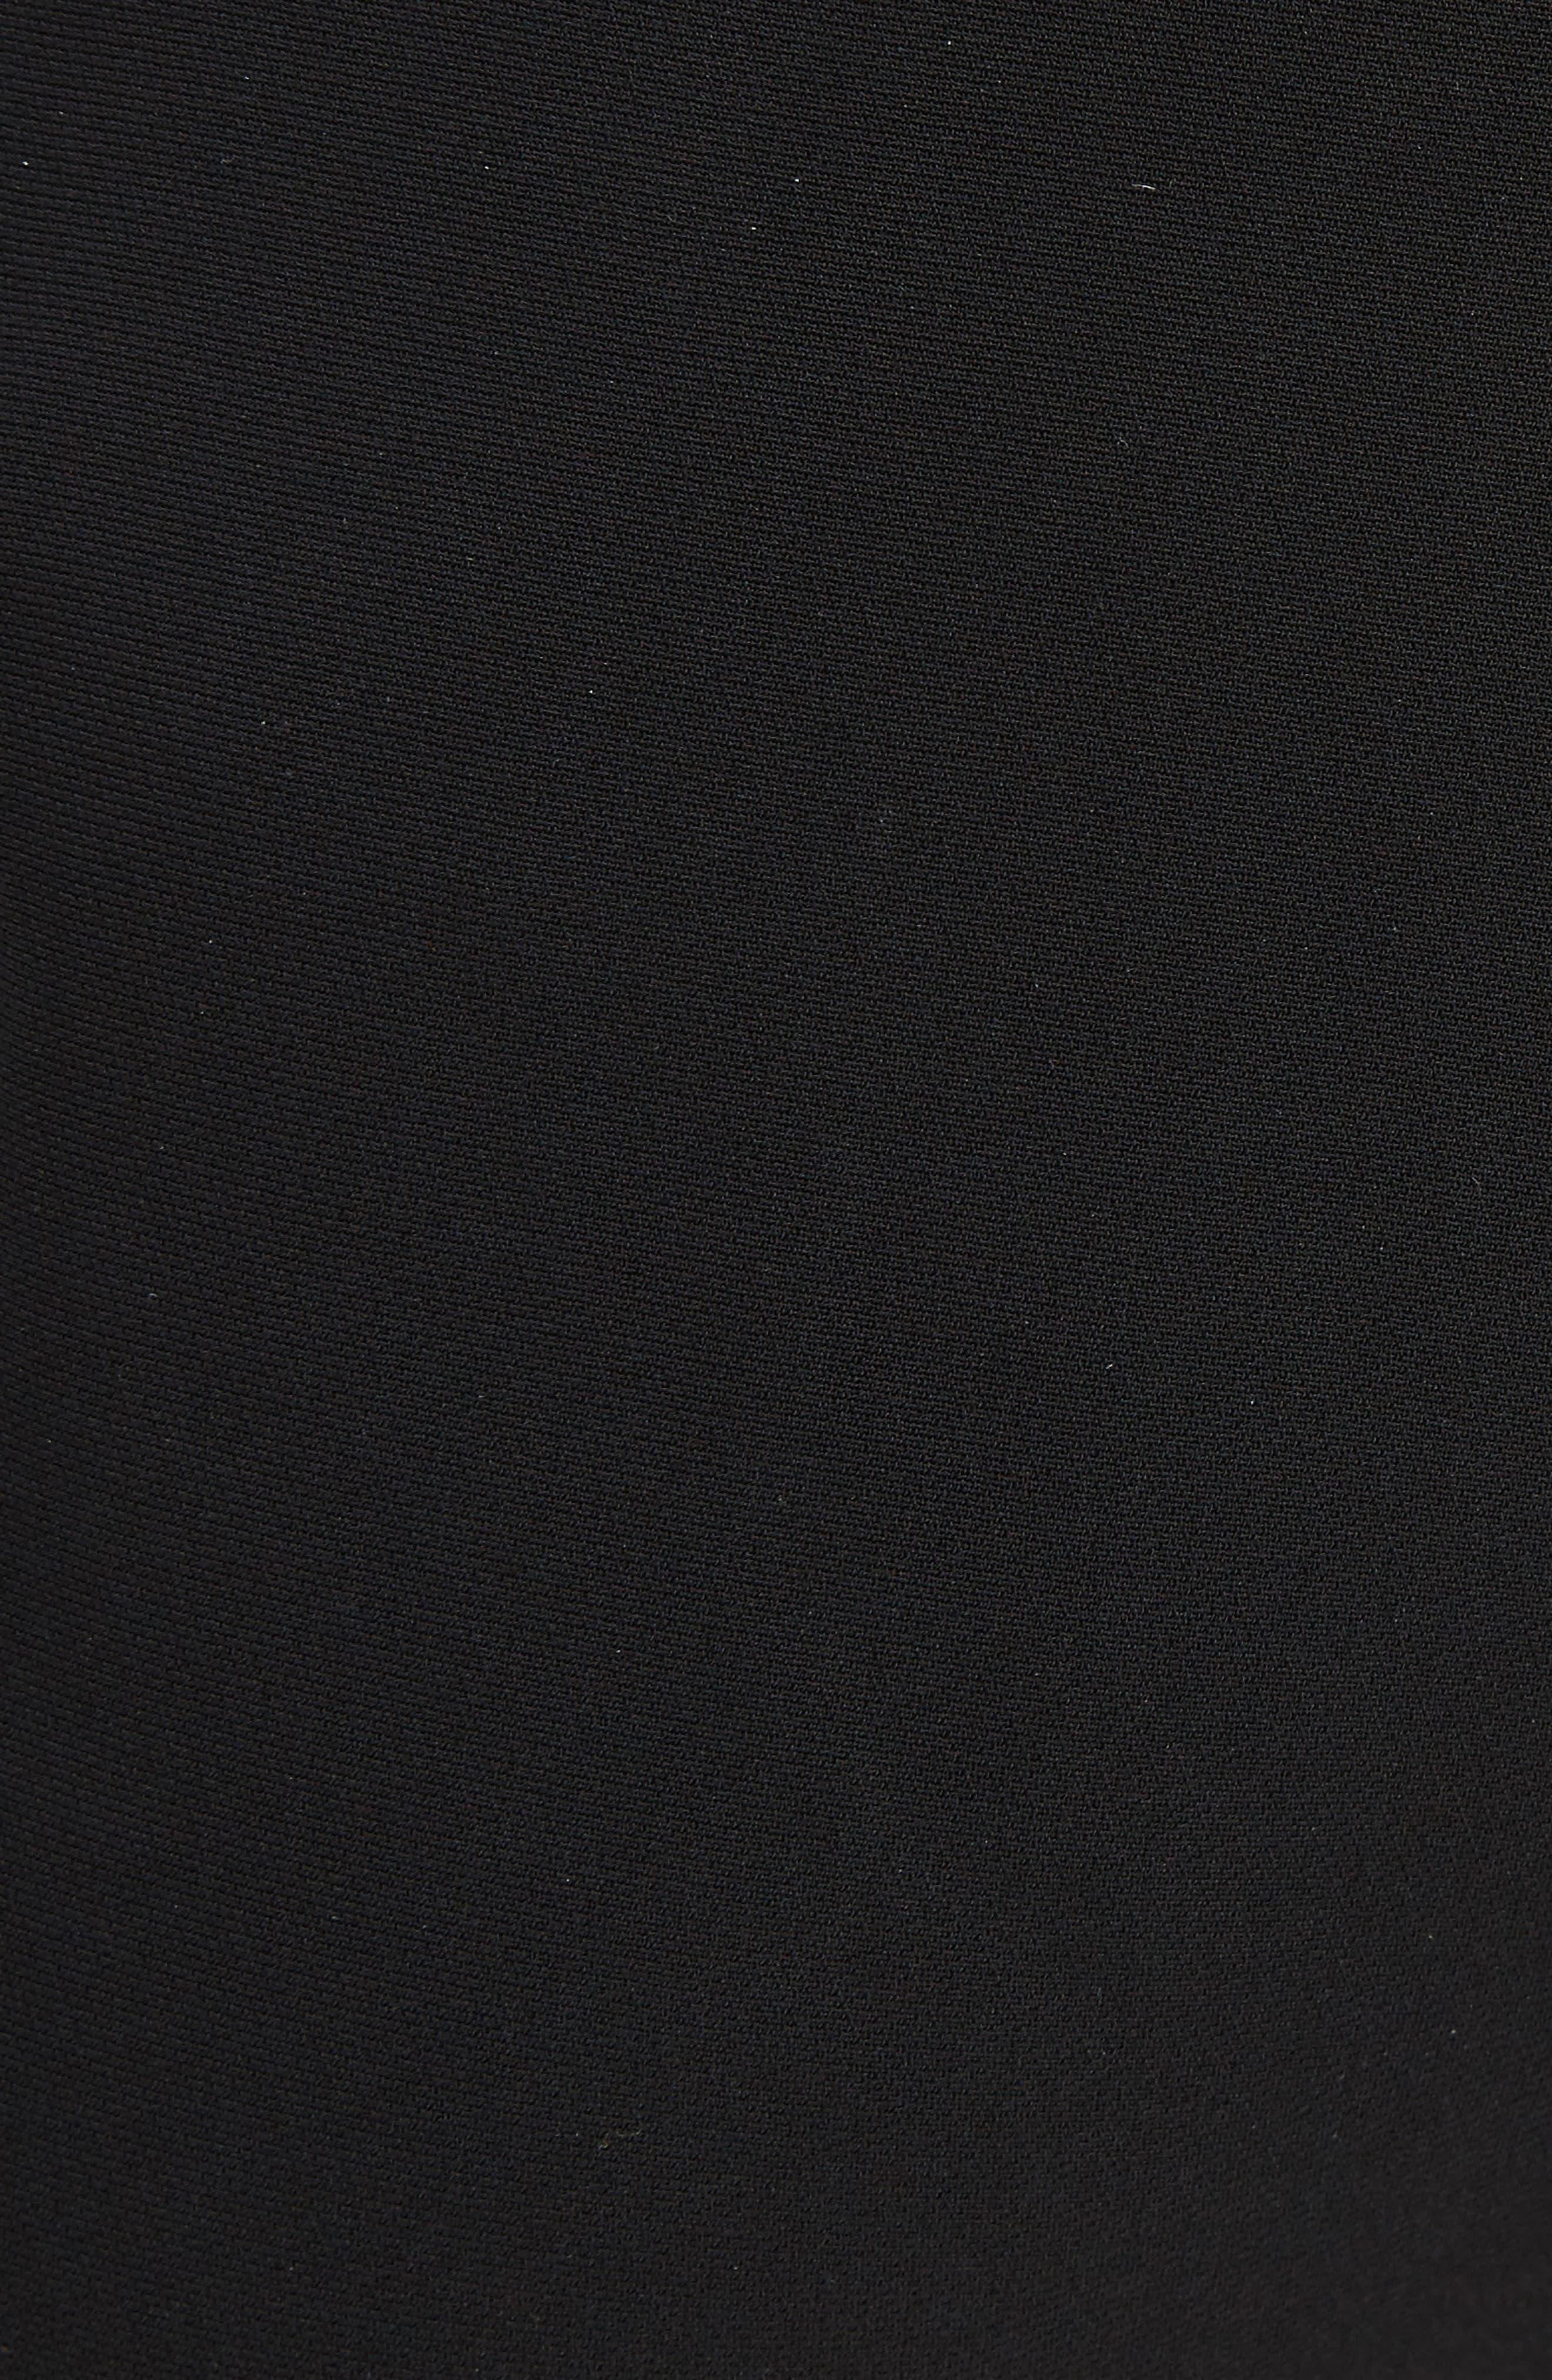 Henri Stretch Skinny Pants,                             Alternate thumbnail 5, color,                             001